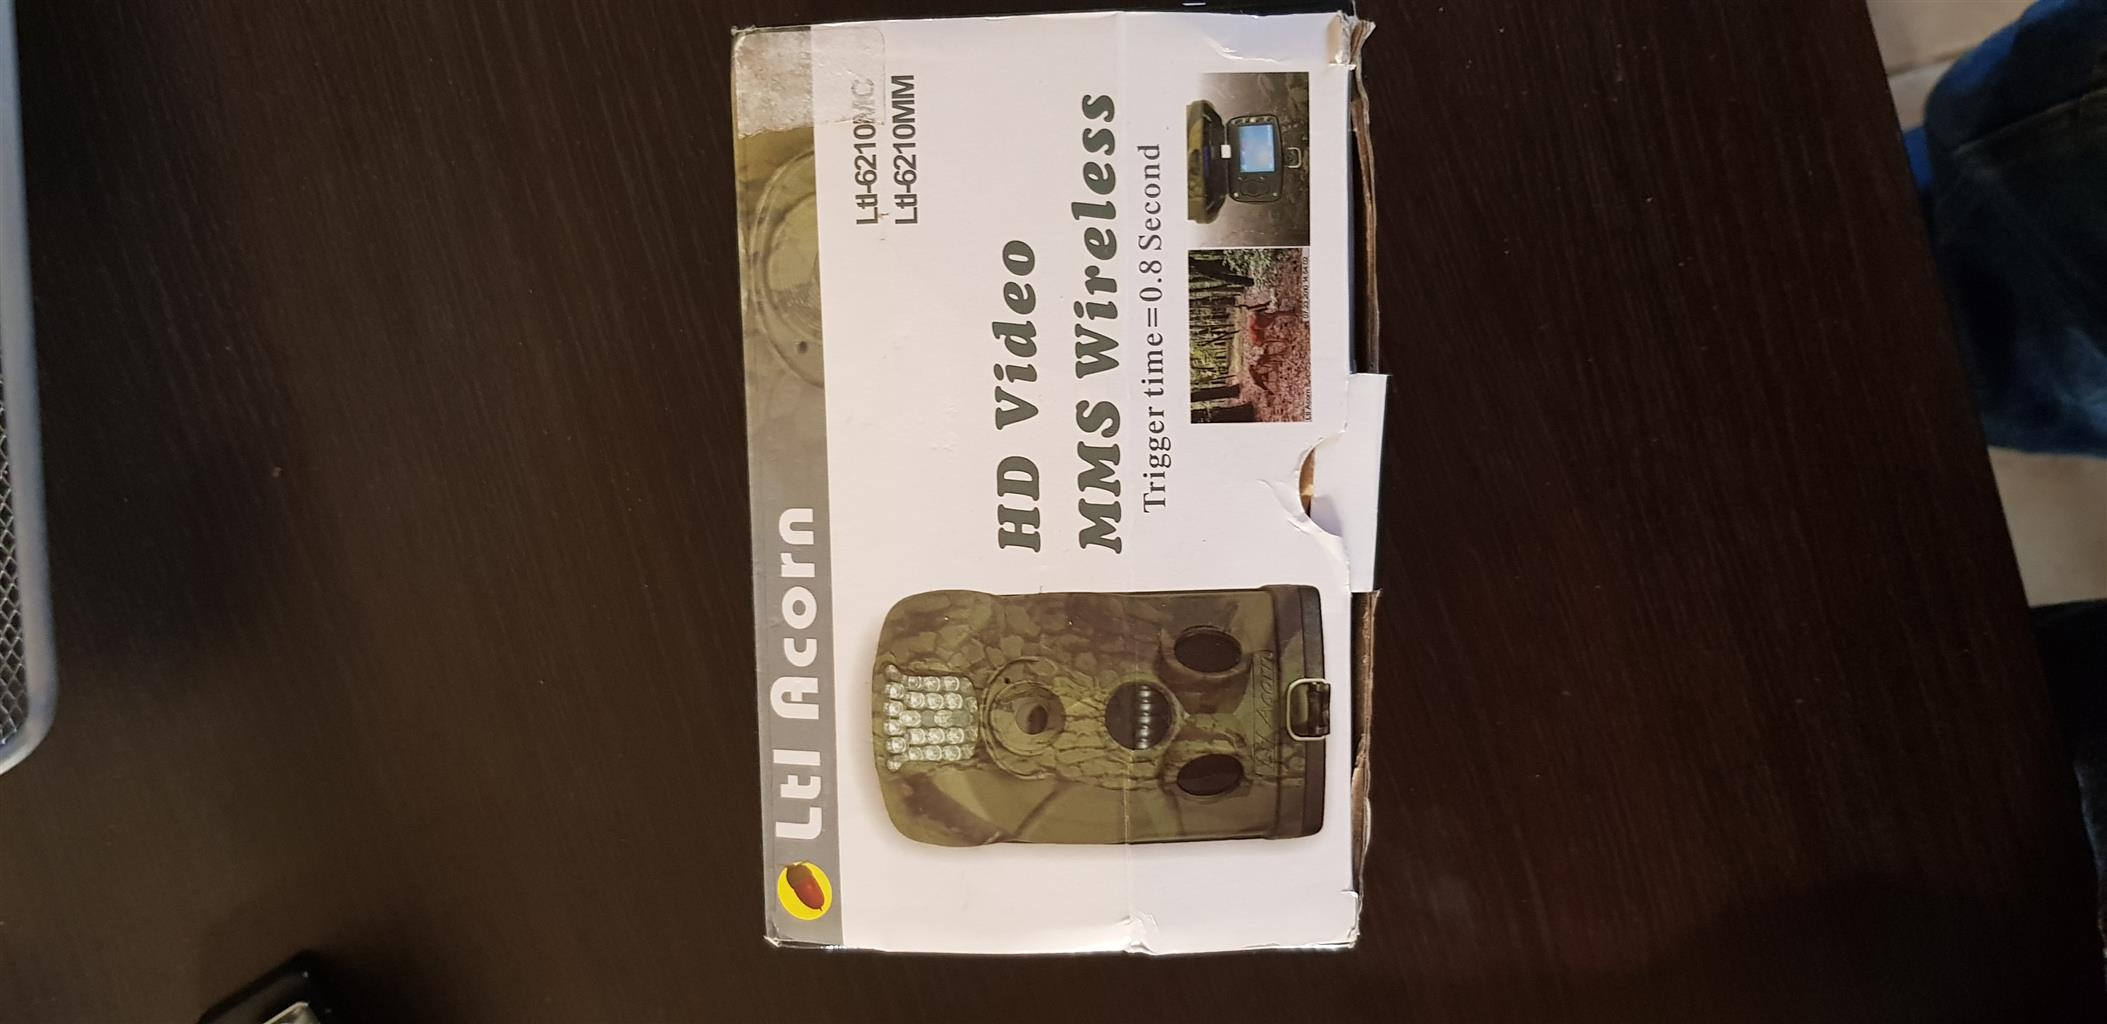 GameTrail Camera